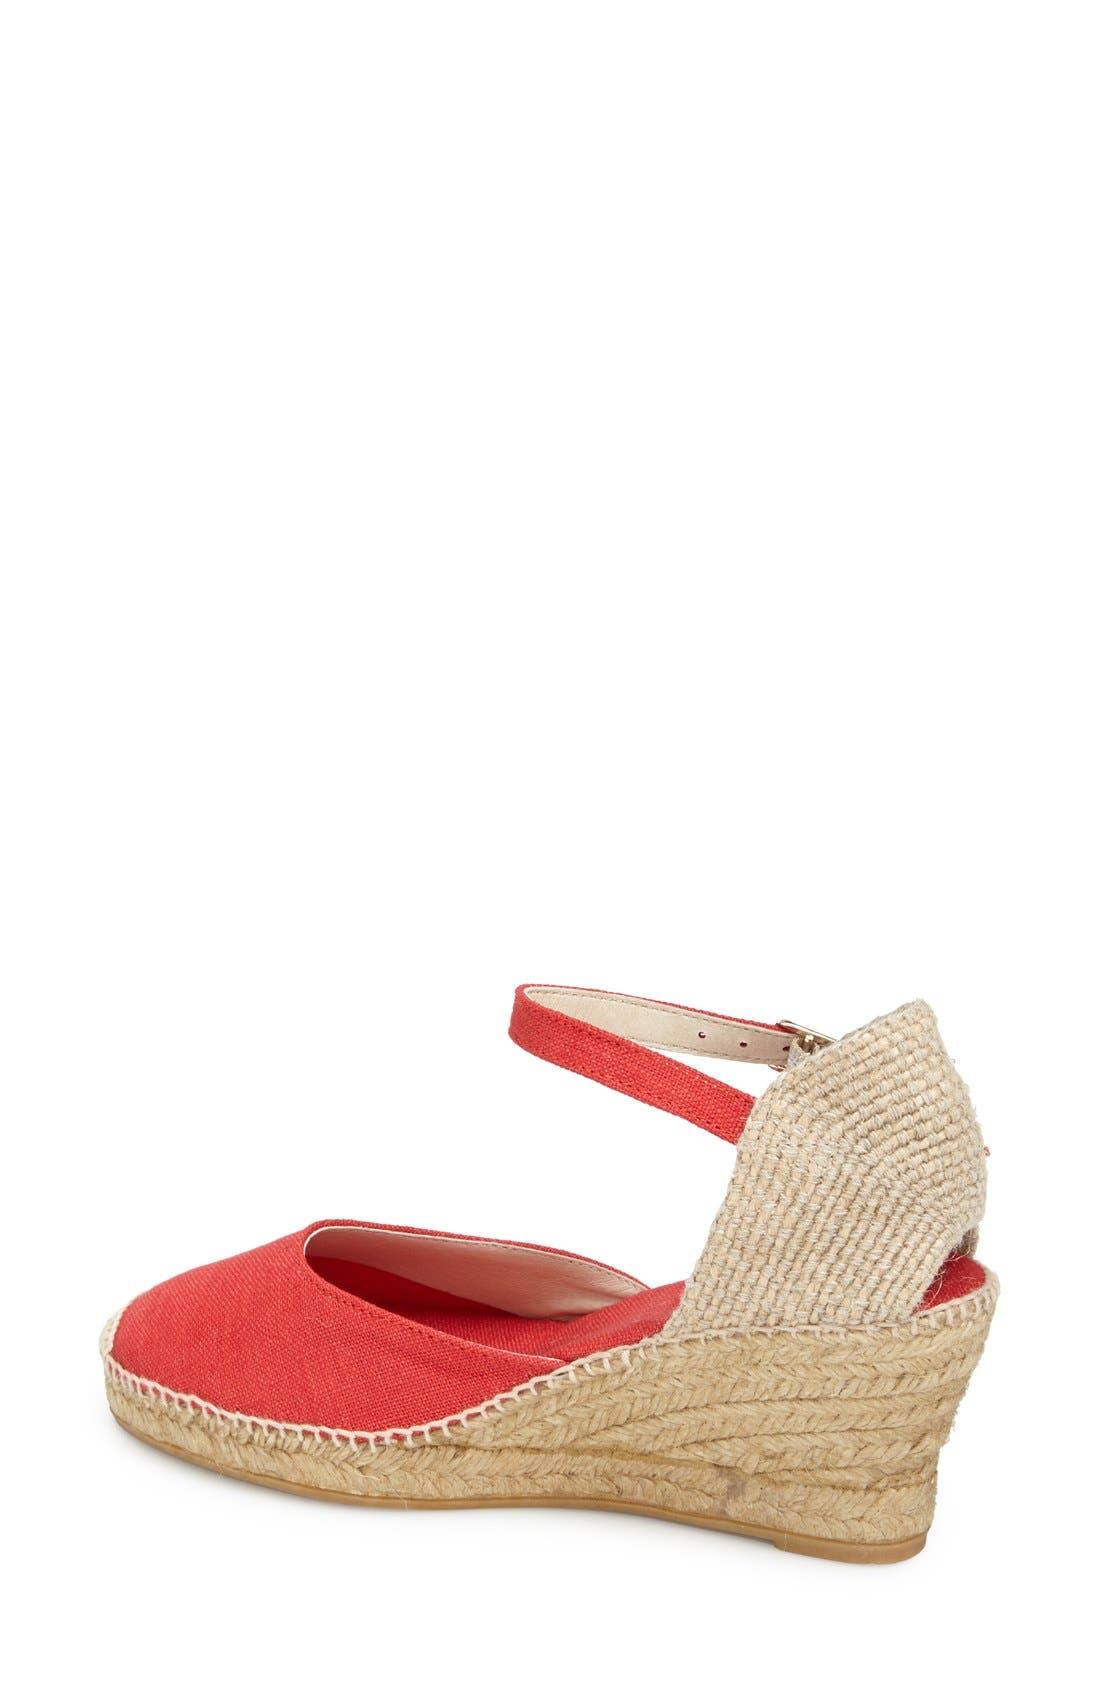 61d12adf1876 Women s Espadrille Sandals